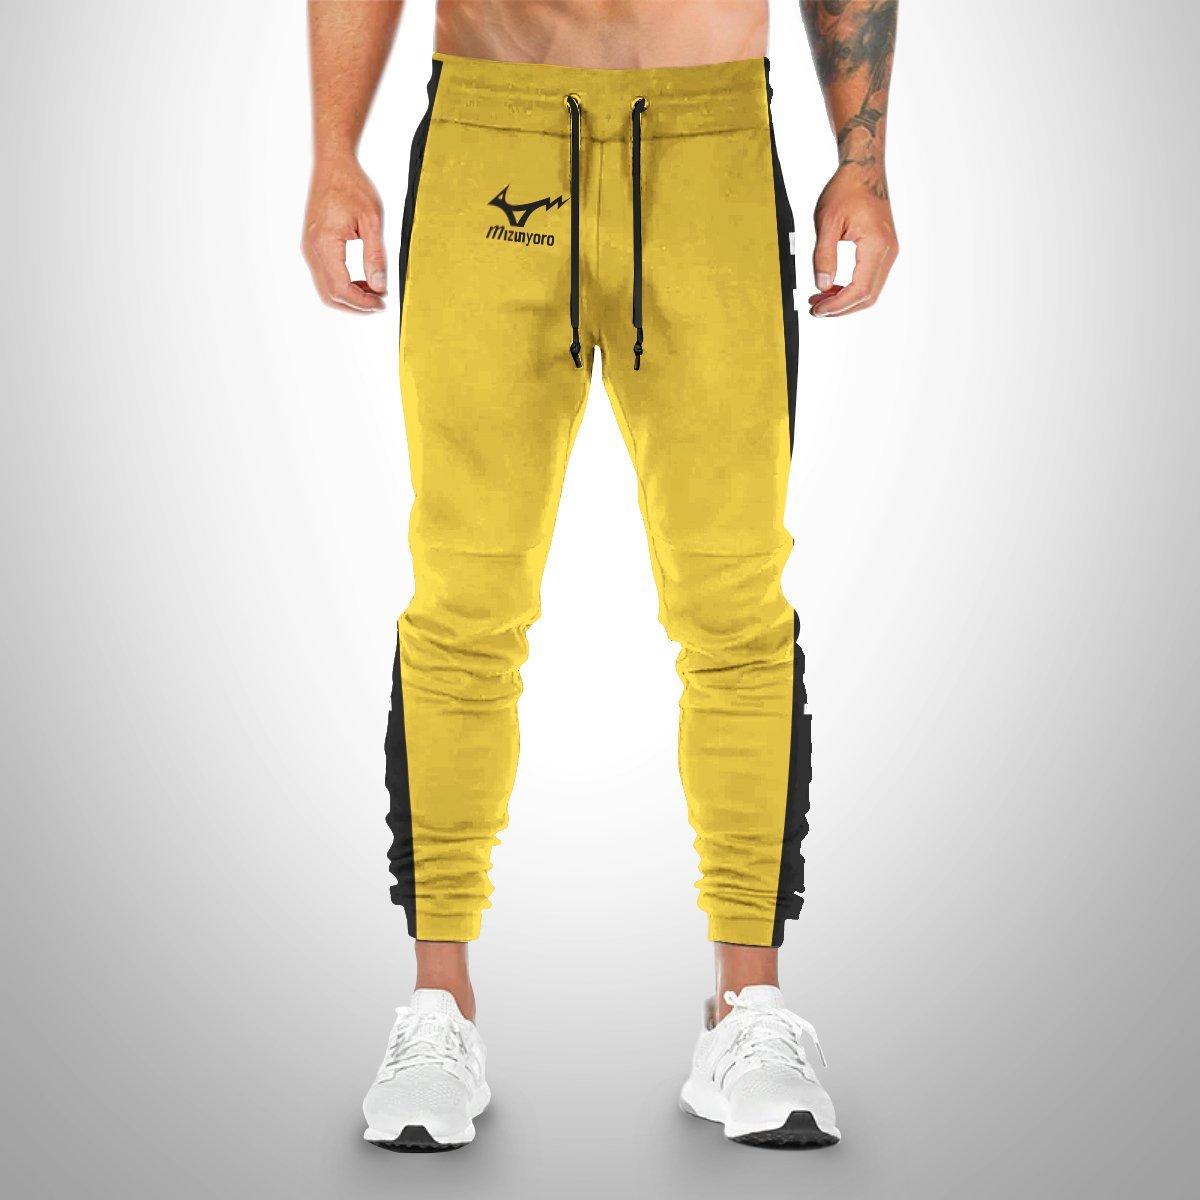 johzenji libero jogger pants 614625 - Otaku Treat